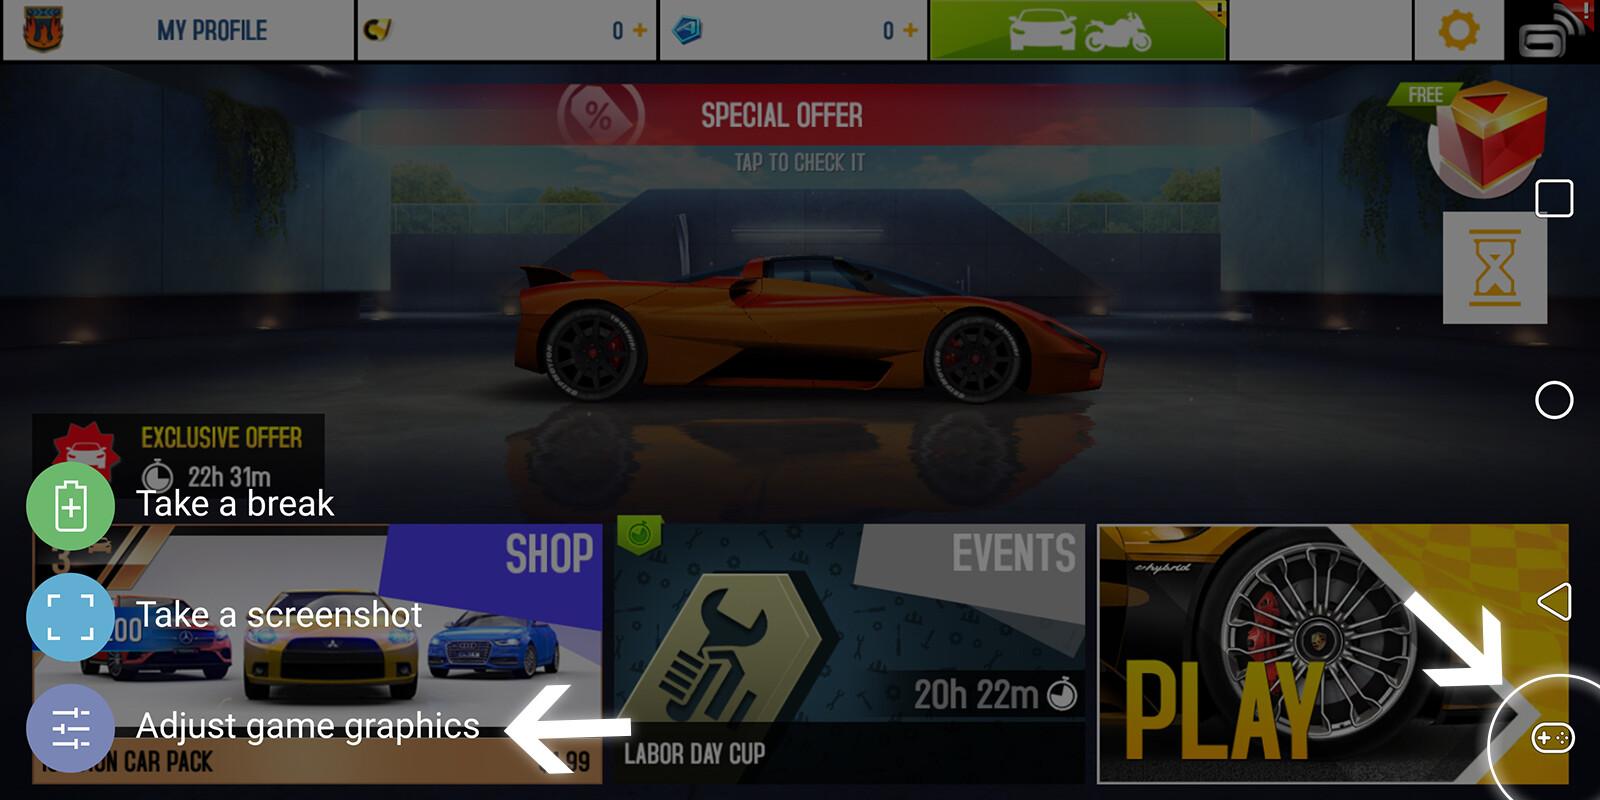 How to use LG V30 Game Tools - PhoneArena